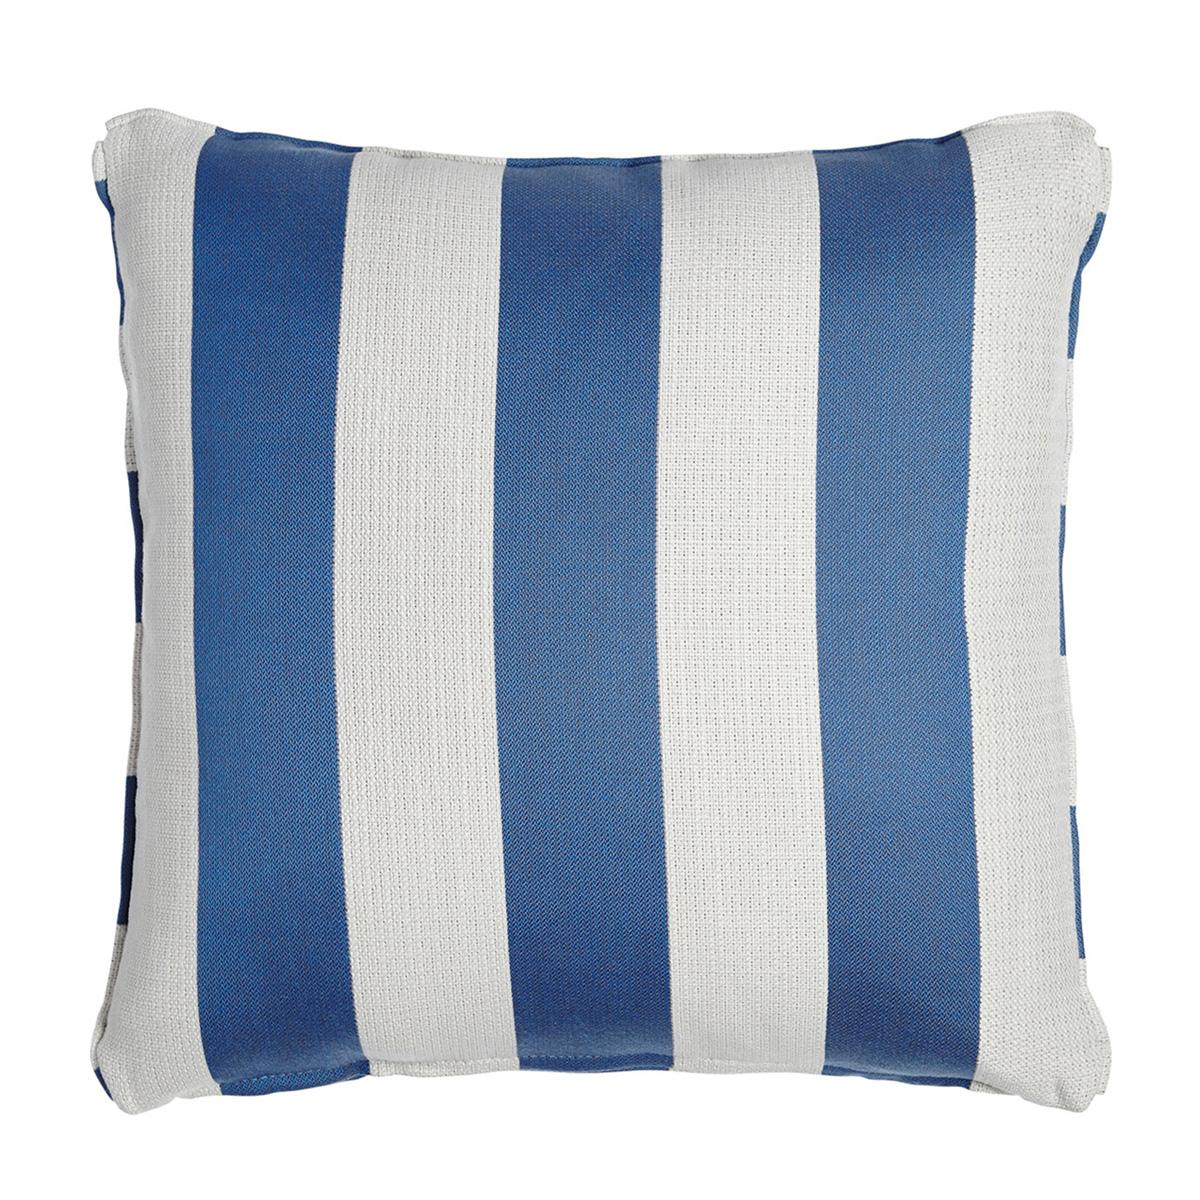 brown jordan blue and white stripe outdoor pillow.jpg